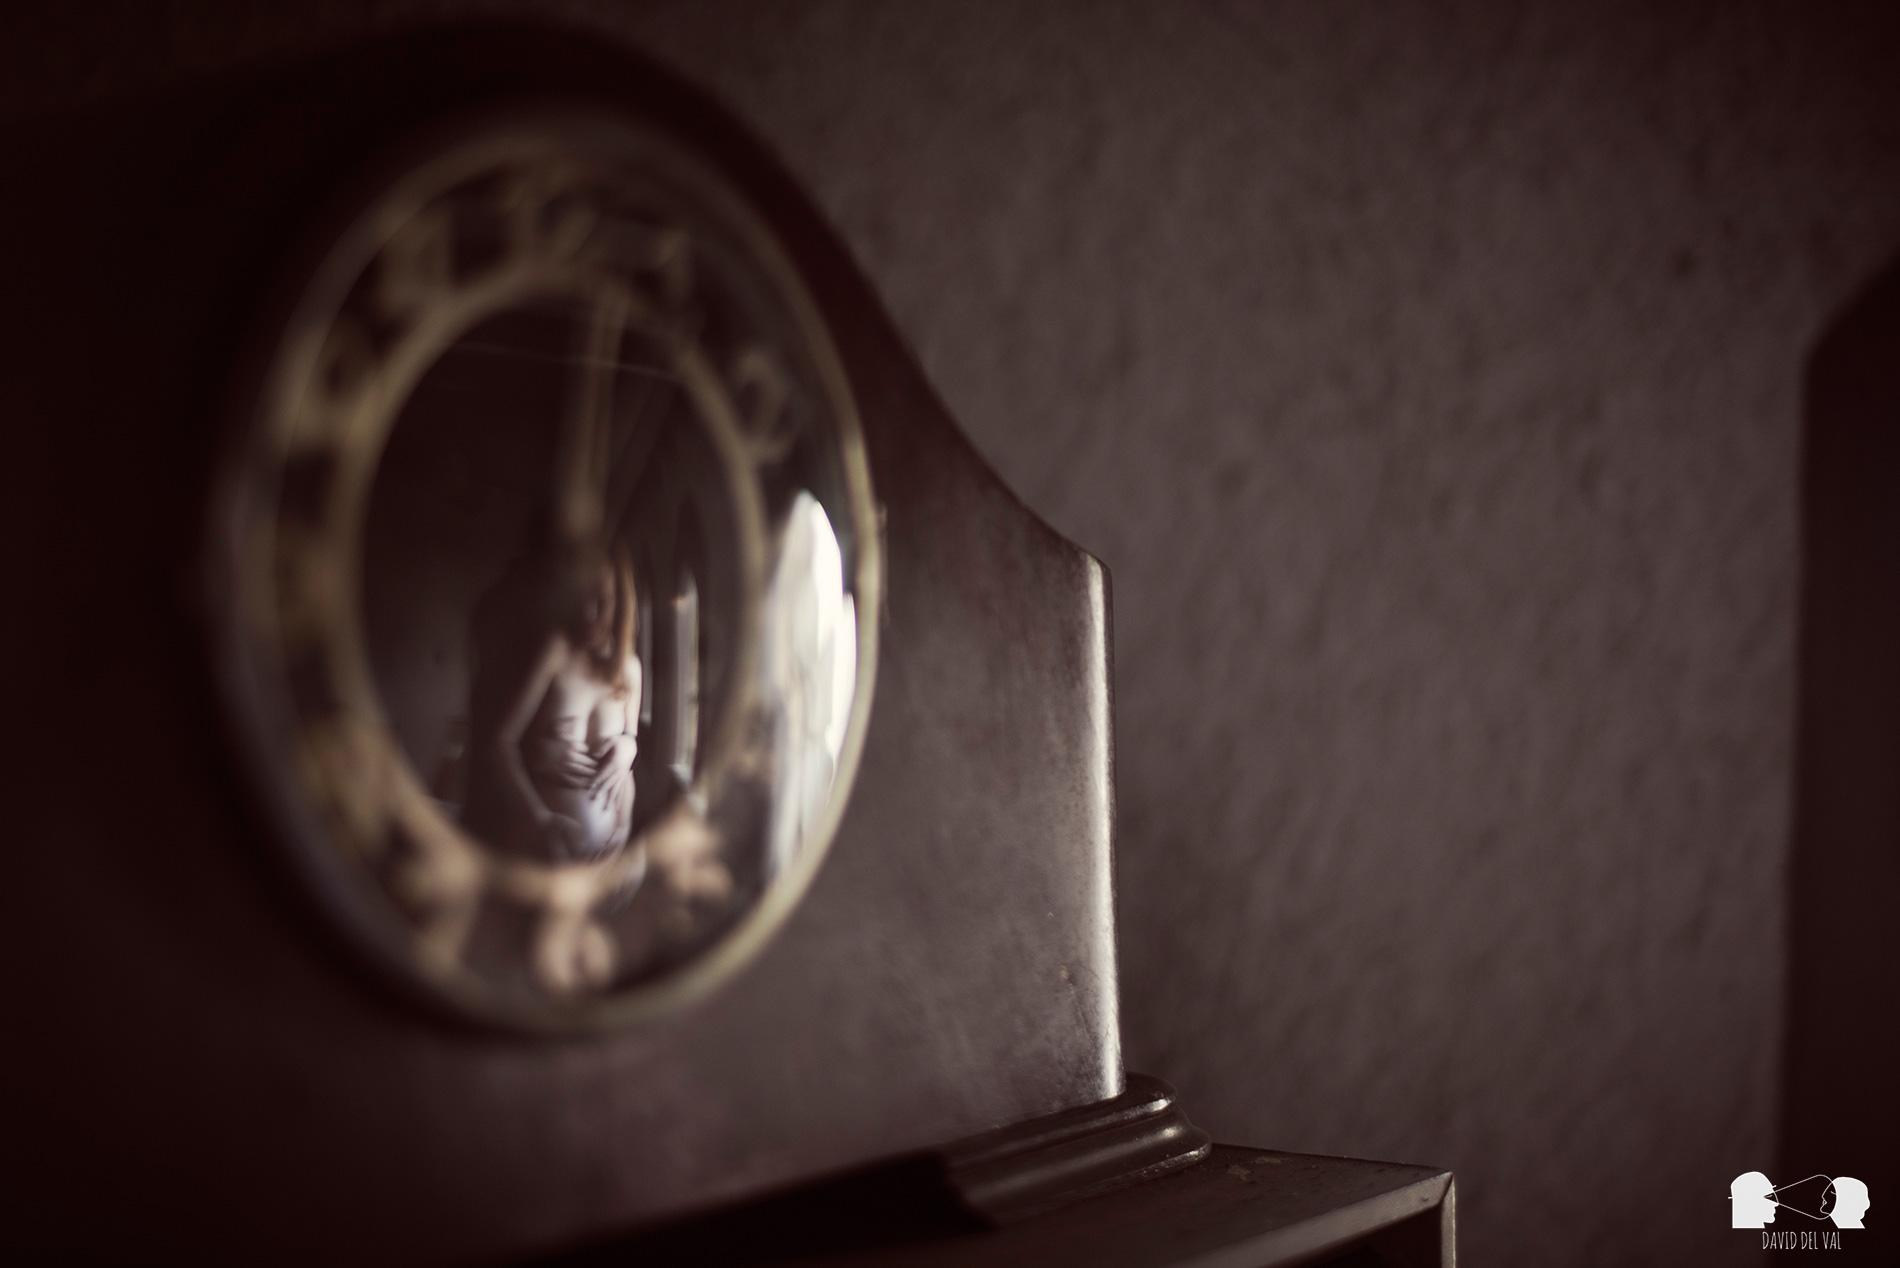 sessio-de-familia-exterios-casa-rural-fotograf-de-nens-sessio-embaras-ambaraçada